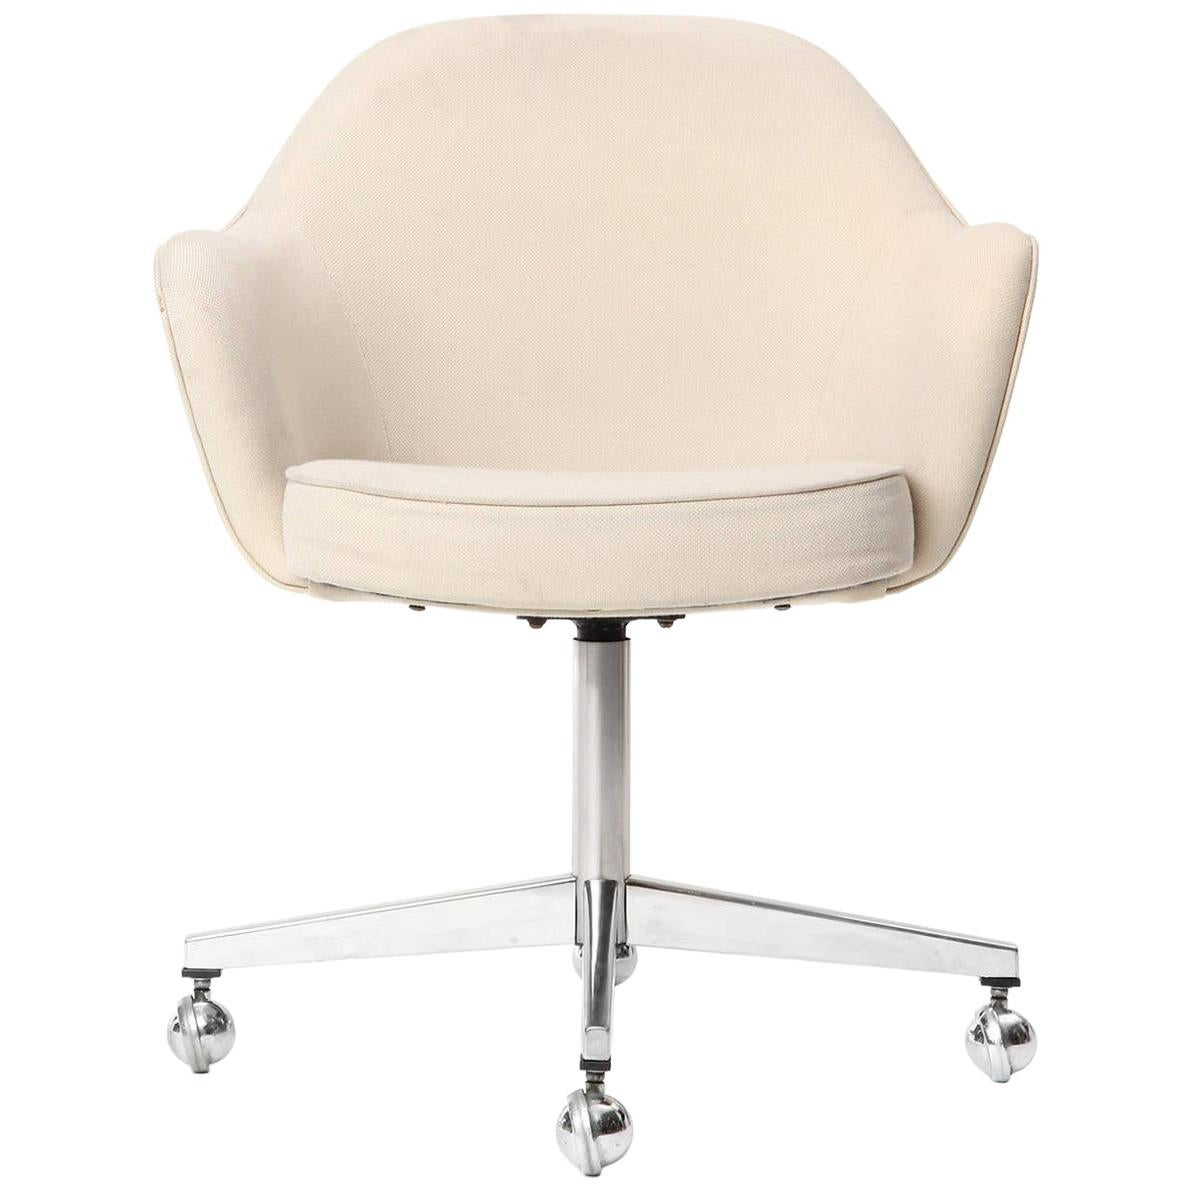 Swiveling Armchair by Eero Saarinen for Knoll